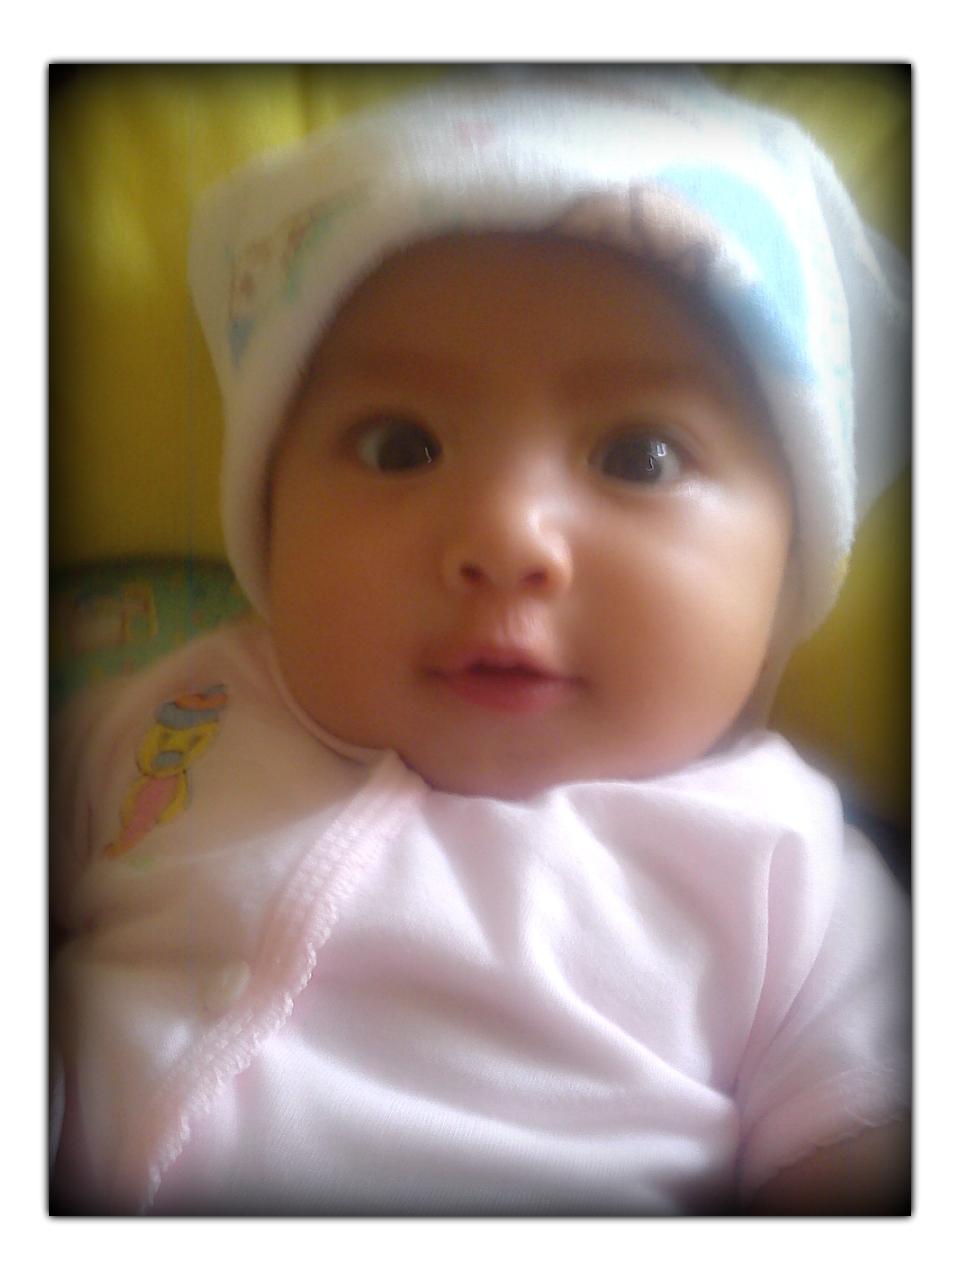 Bubur Bayi 6 Bulan Buatan Sendiri Bisa Kok Bun!